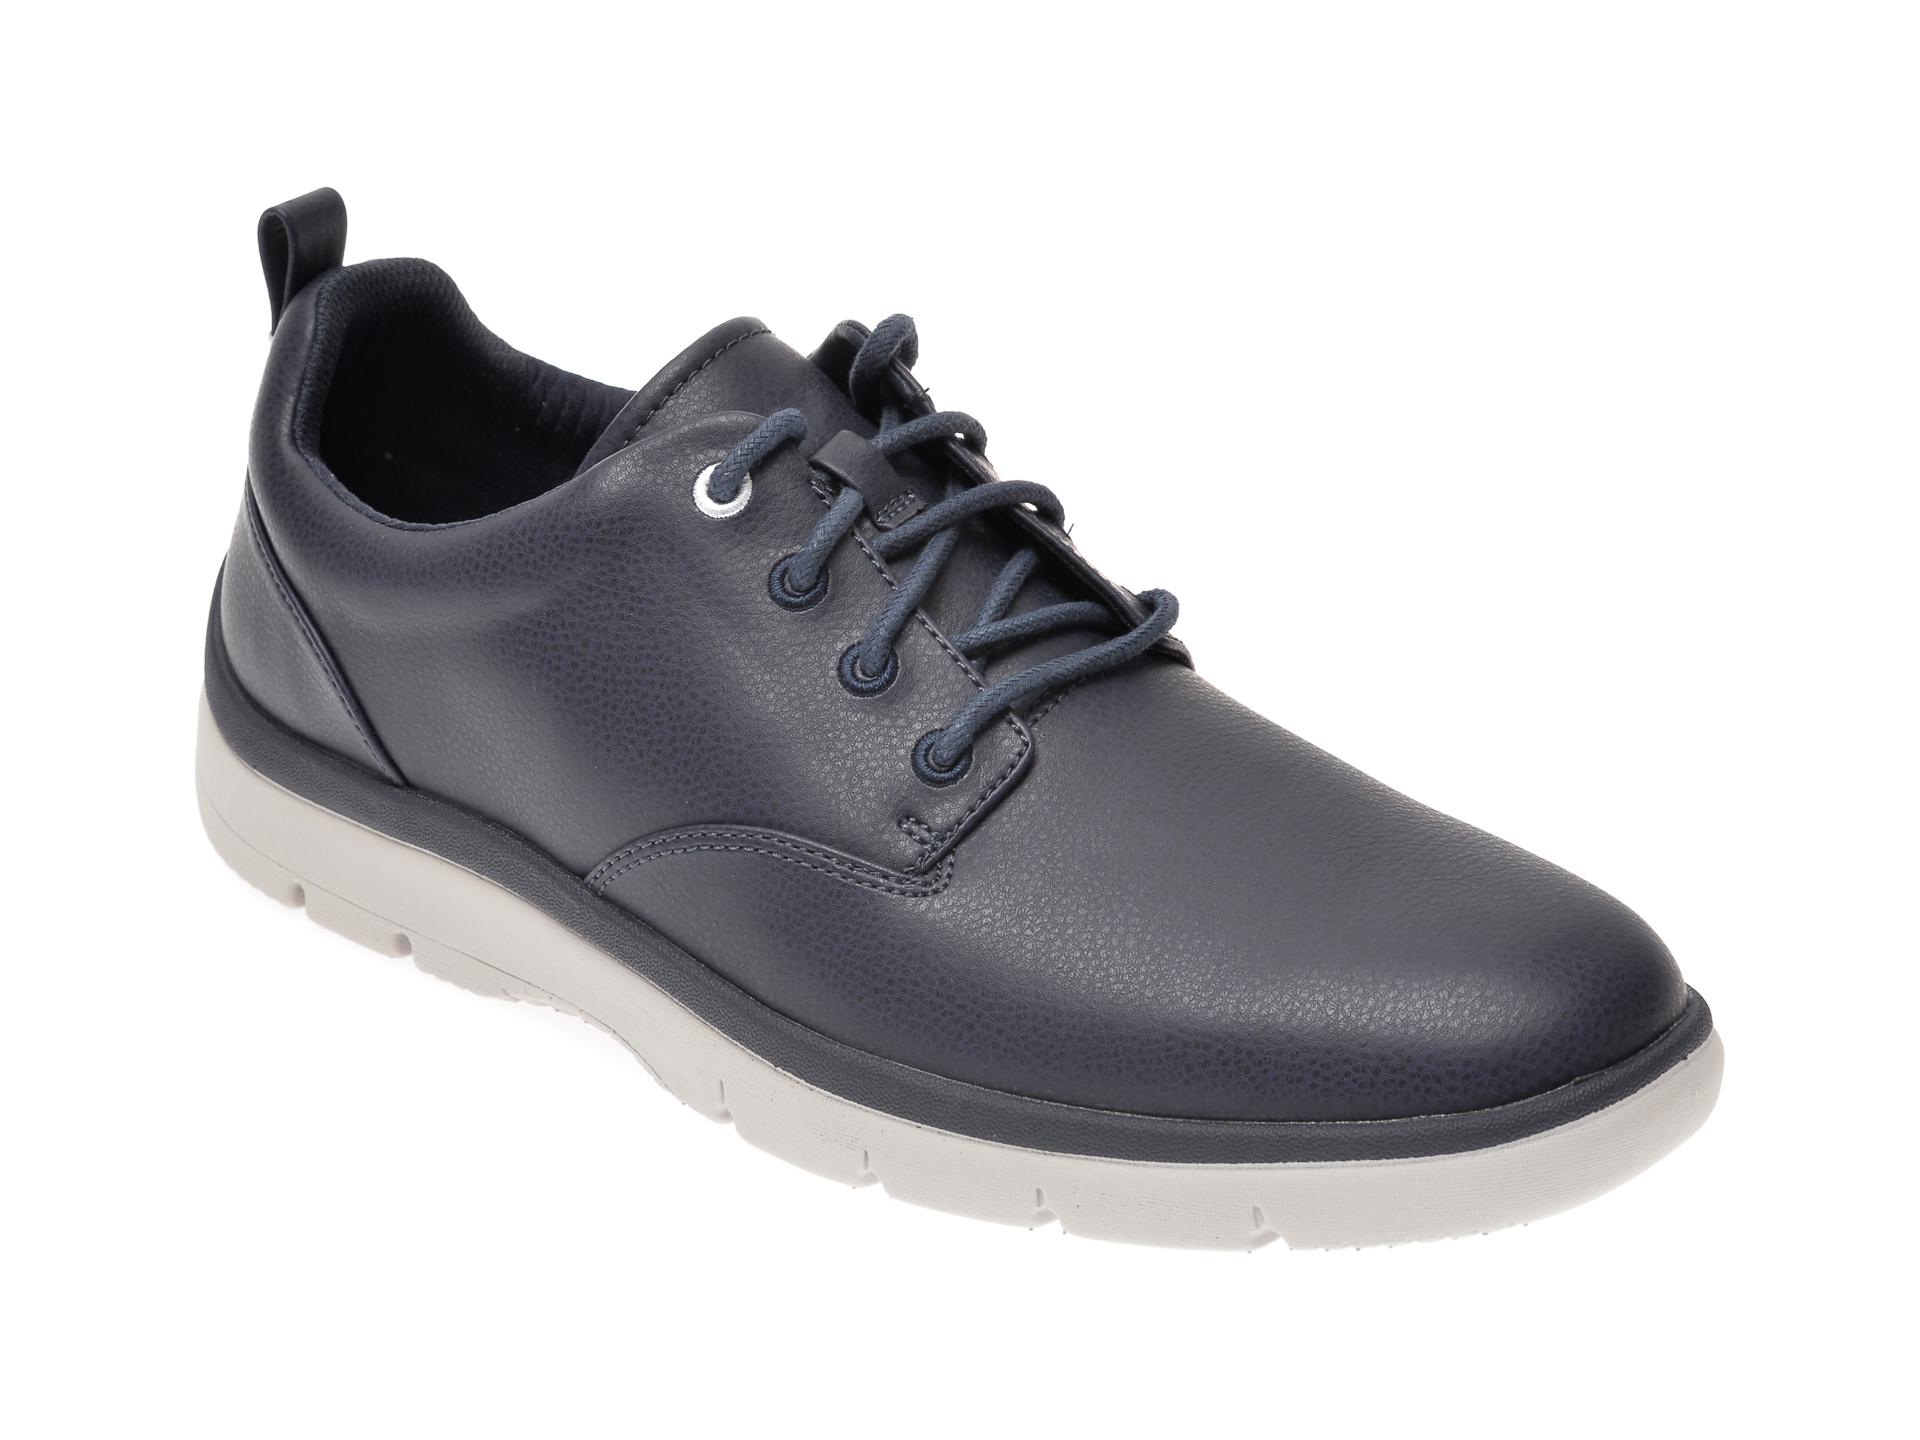 Pantofi CLARKS bleumarin, Tunsil Lane, din piele ecologica New